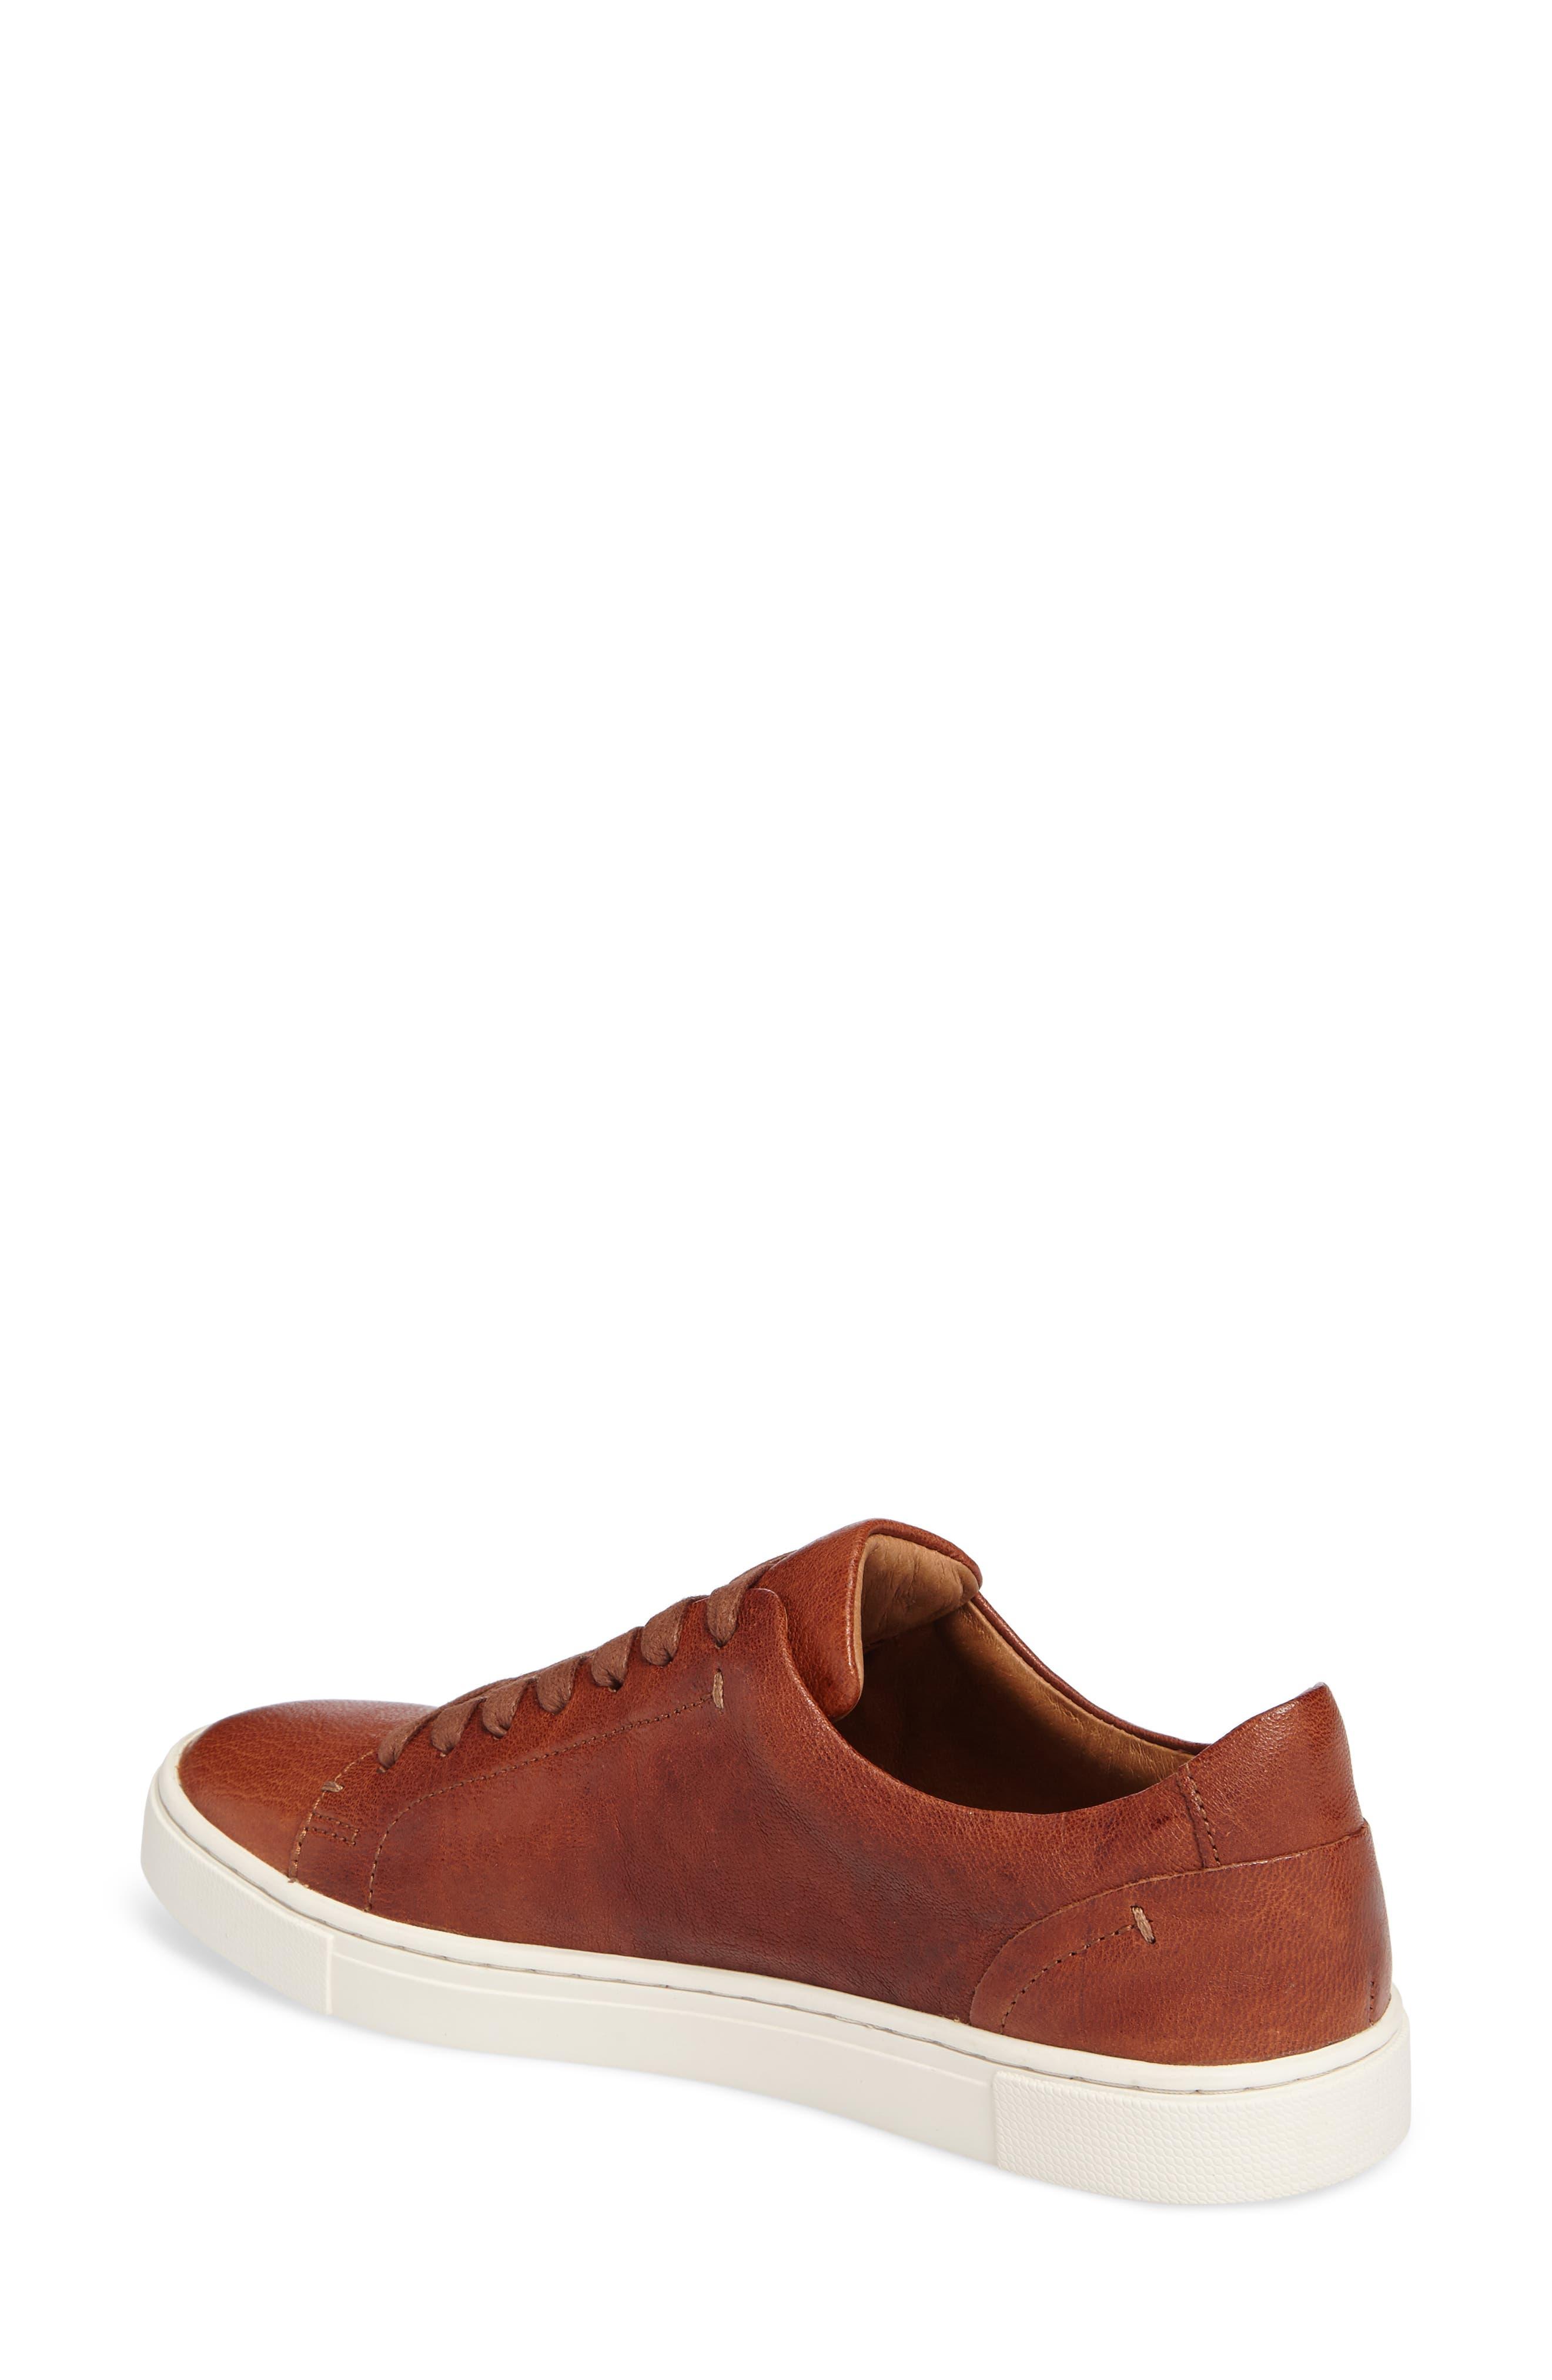 Ivy Sneaker,                             Alternate thumbnail 2, color,                             235